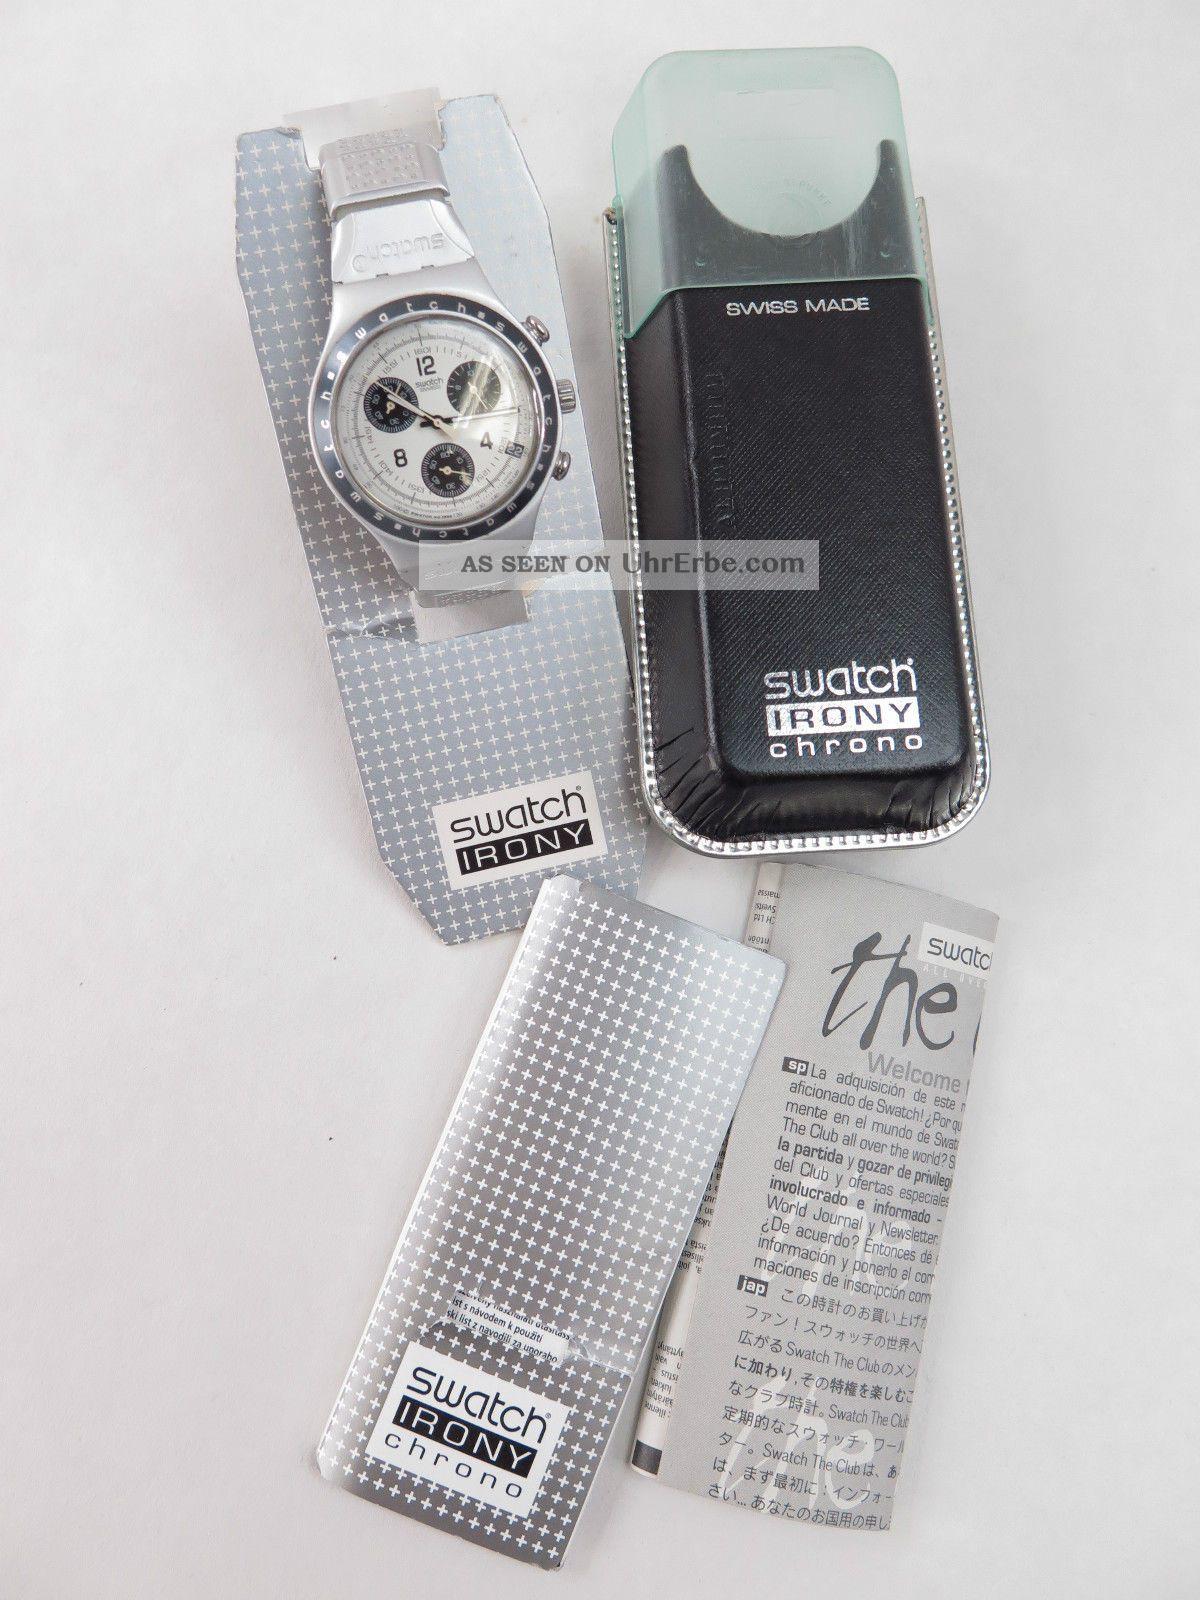 Swatch Irony Chronograph Ycs4001 Mit Alu - Armband Ar Armbanduhren Bild